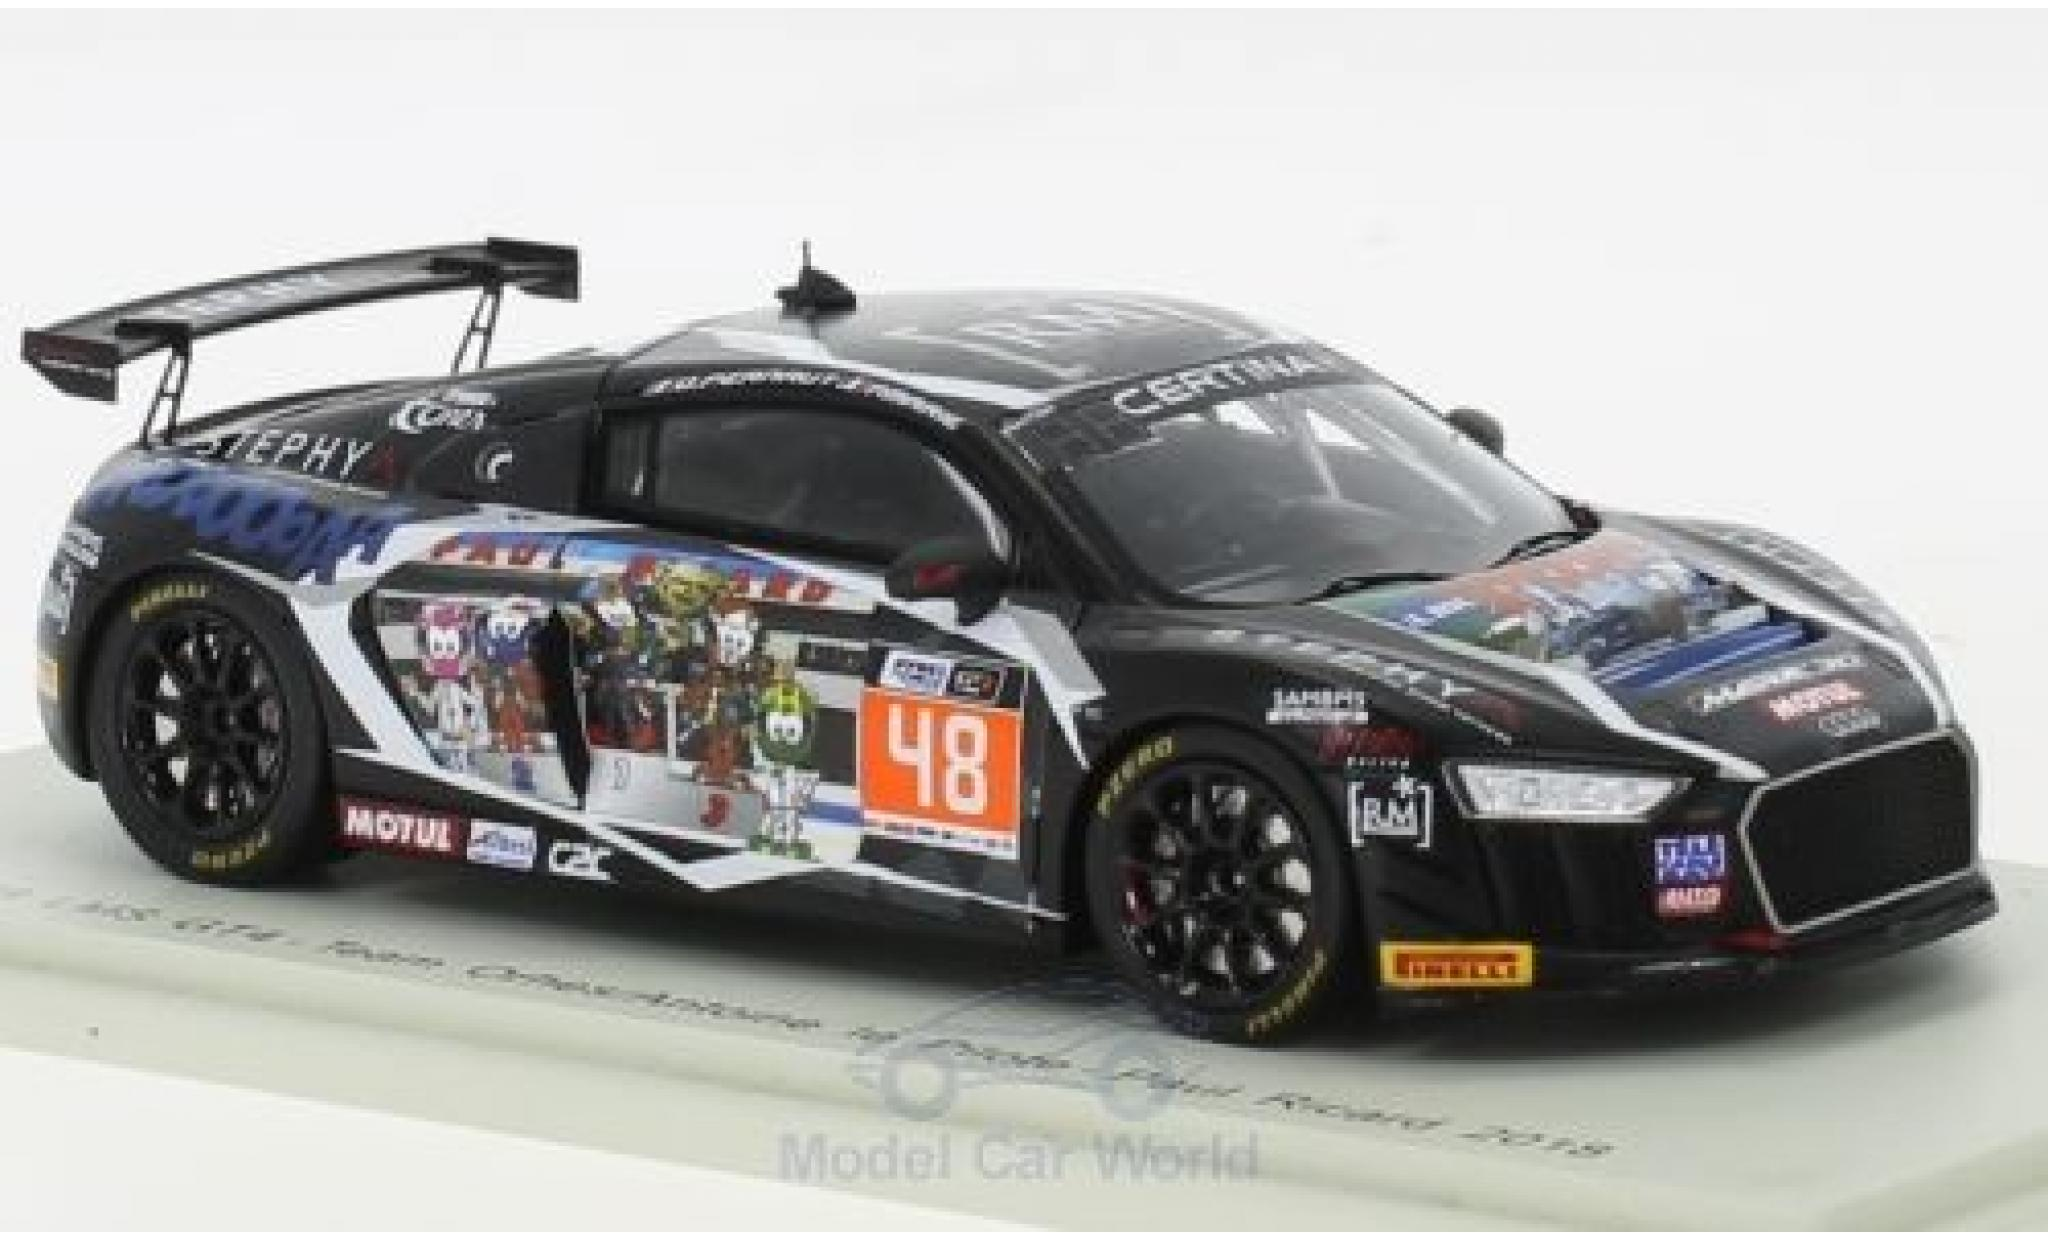 Audi R8 1/43 Spark LMS GT4 No.48 Team Orhes/Antoine le Pilote Paul Ricard 2018 O.Pernaut/P.Marie